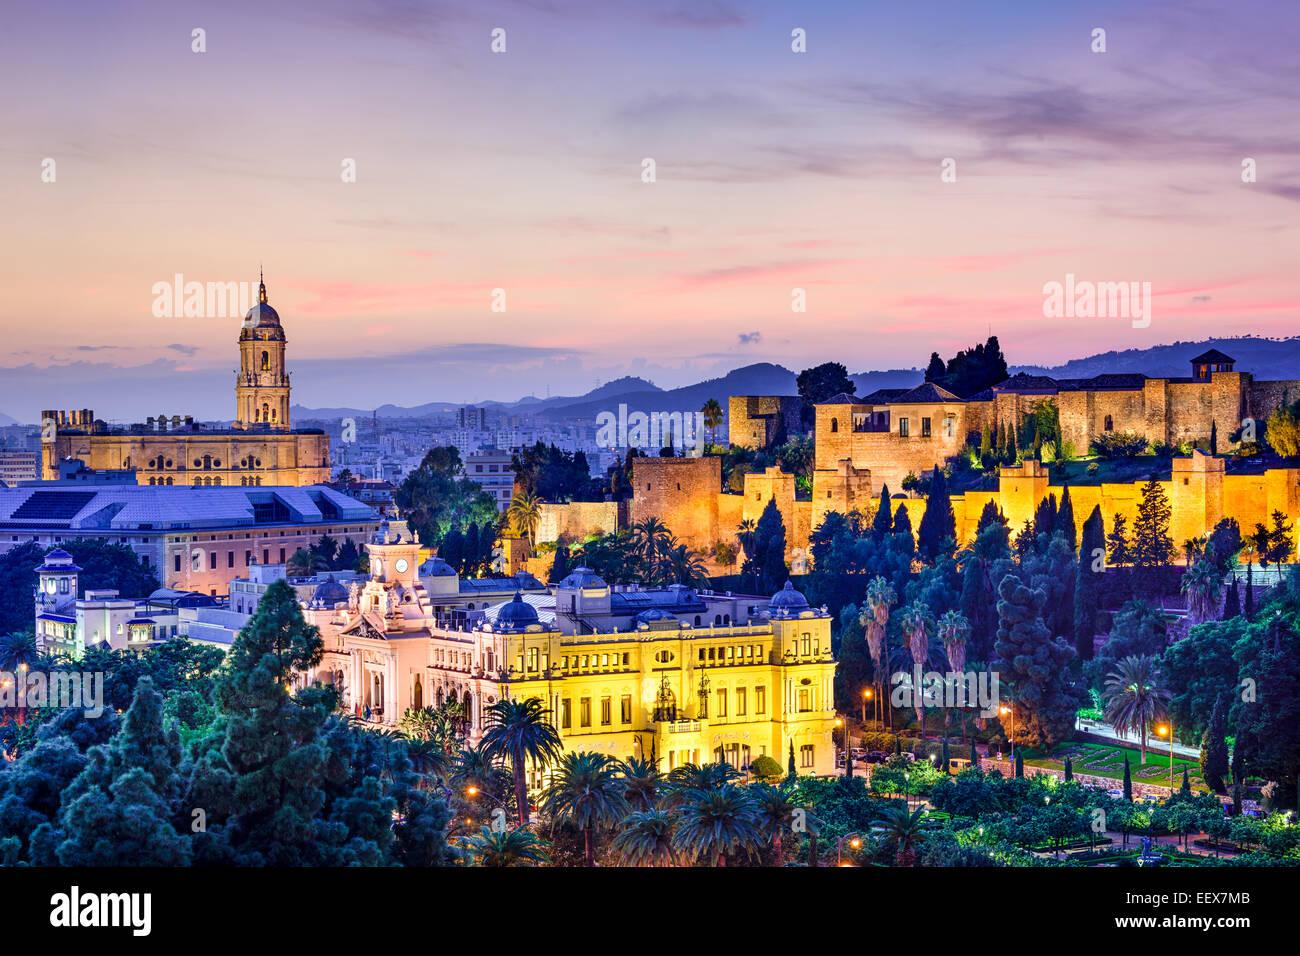 Malaga, Spain cityscape at the Cathedral, City Hall and Alcazaba citadel of Malaga. - Stock Image